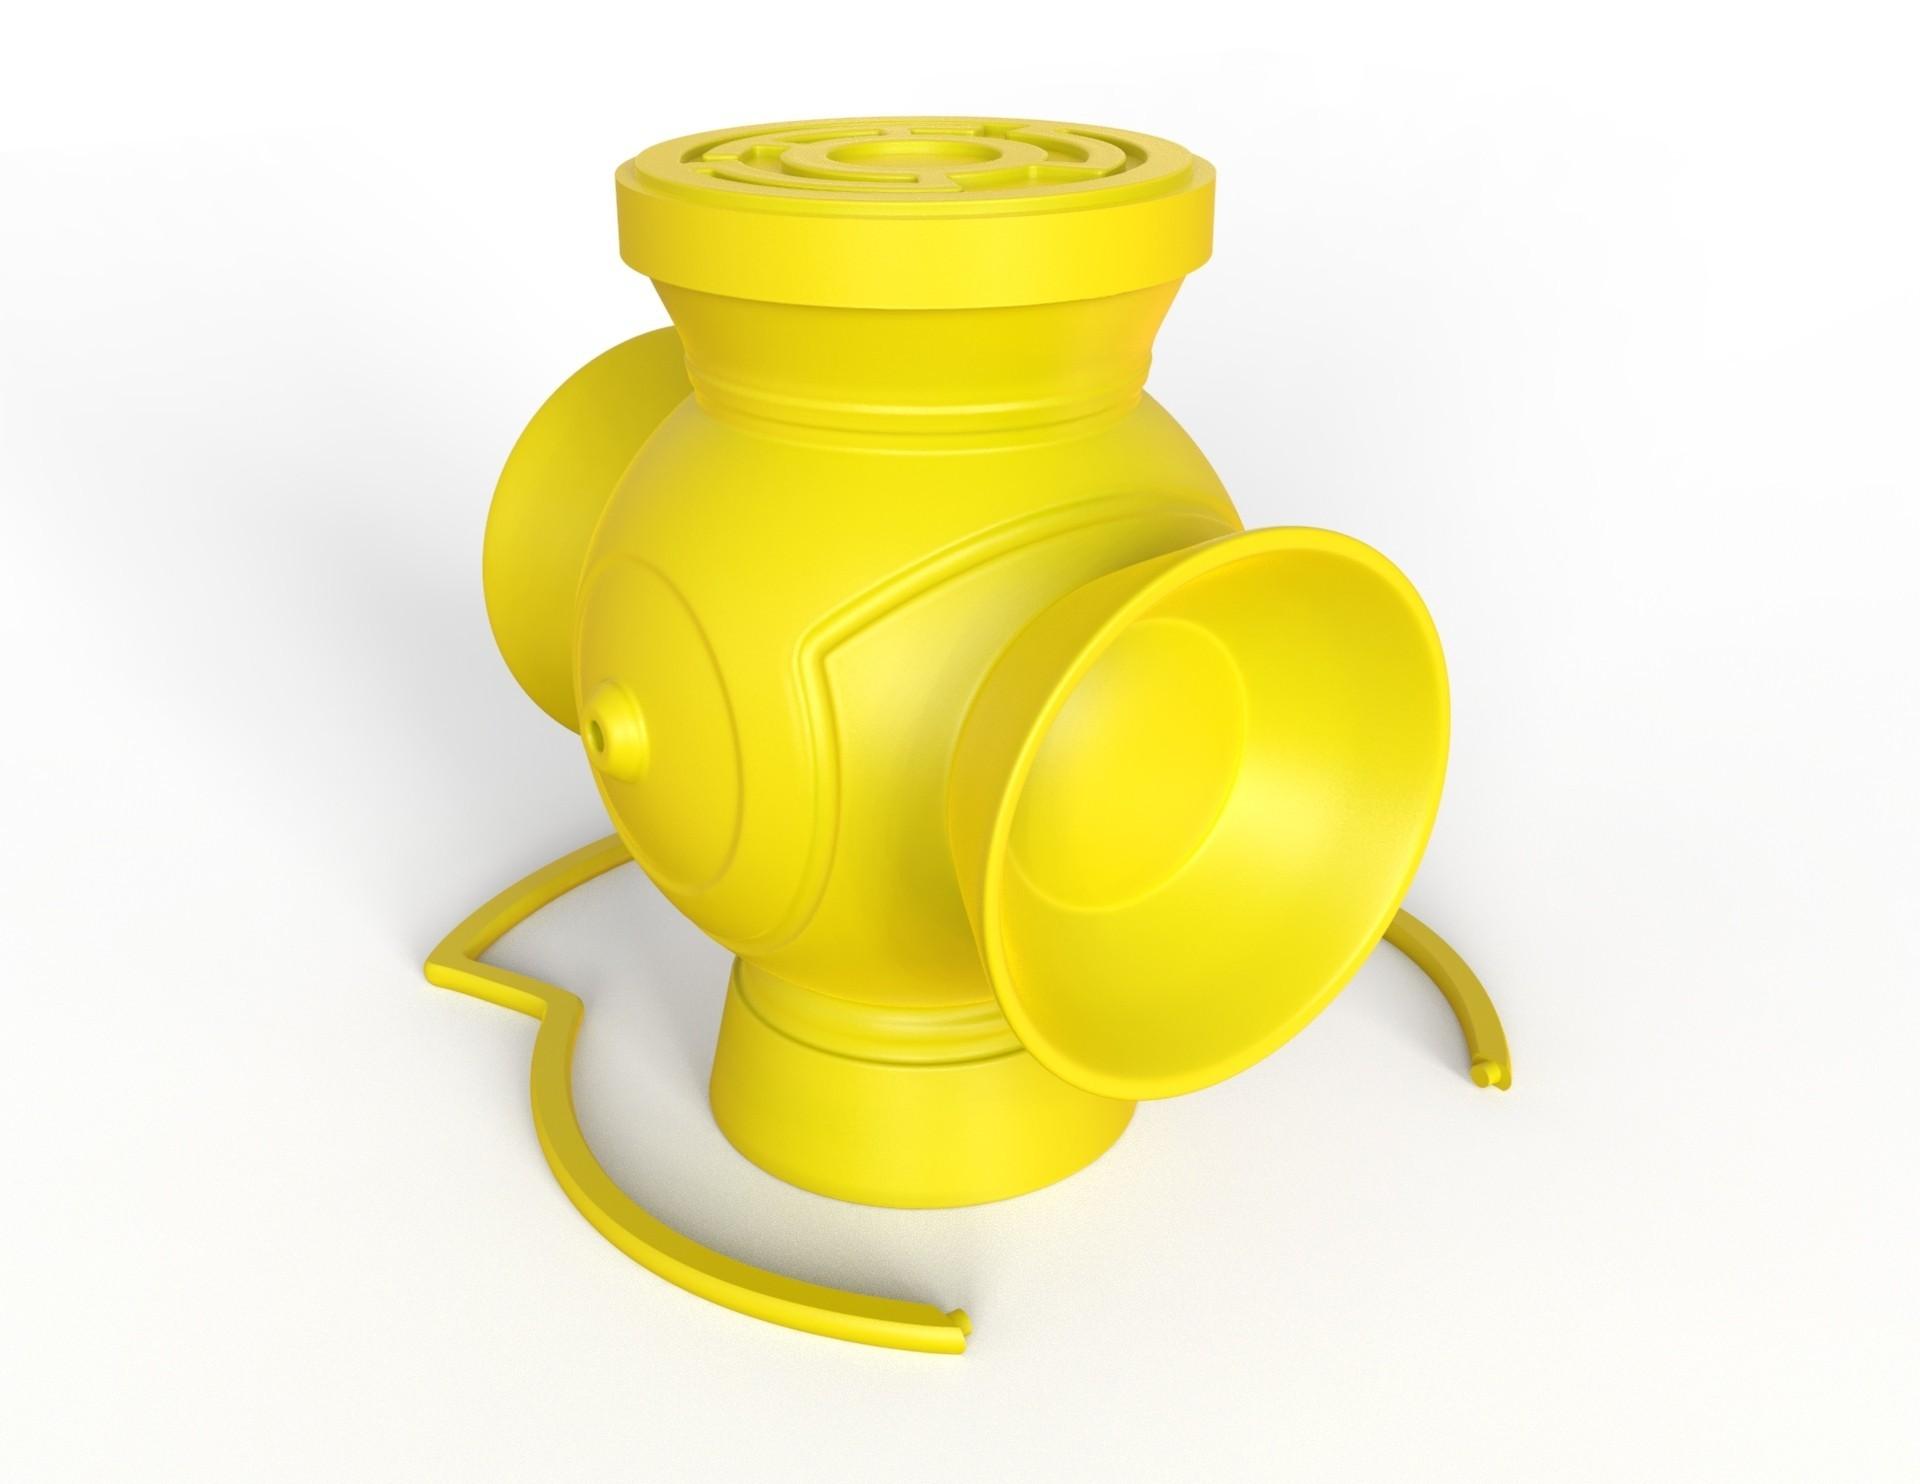 untitled.26.jpg Download free STL file Sinestro Corp Lantern • 3D printing design, roberhlez